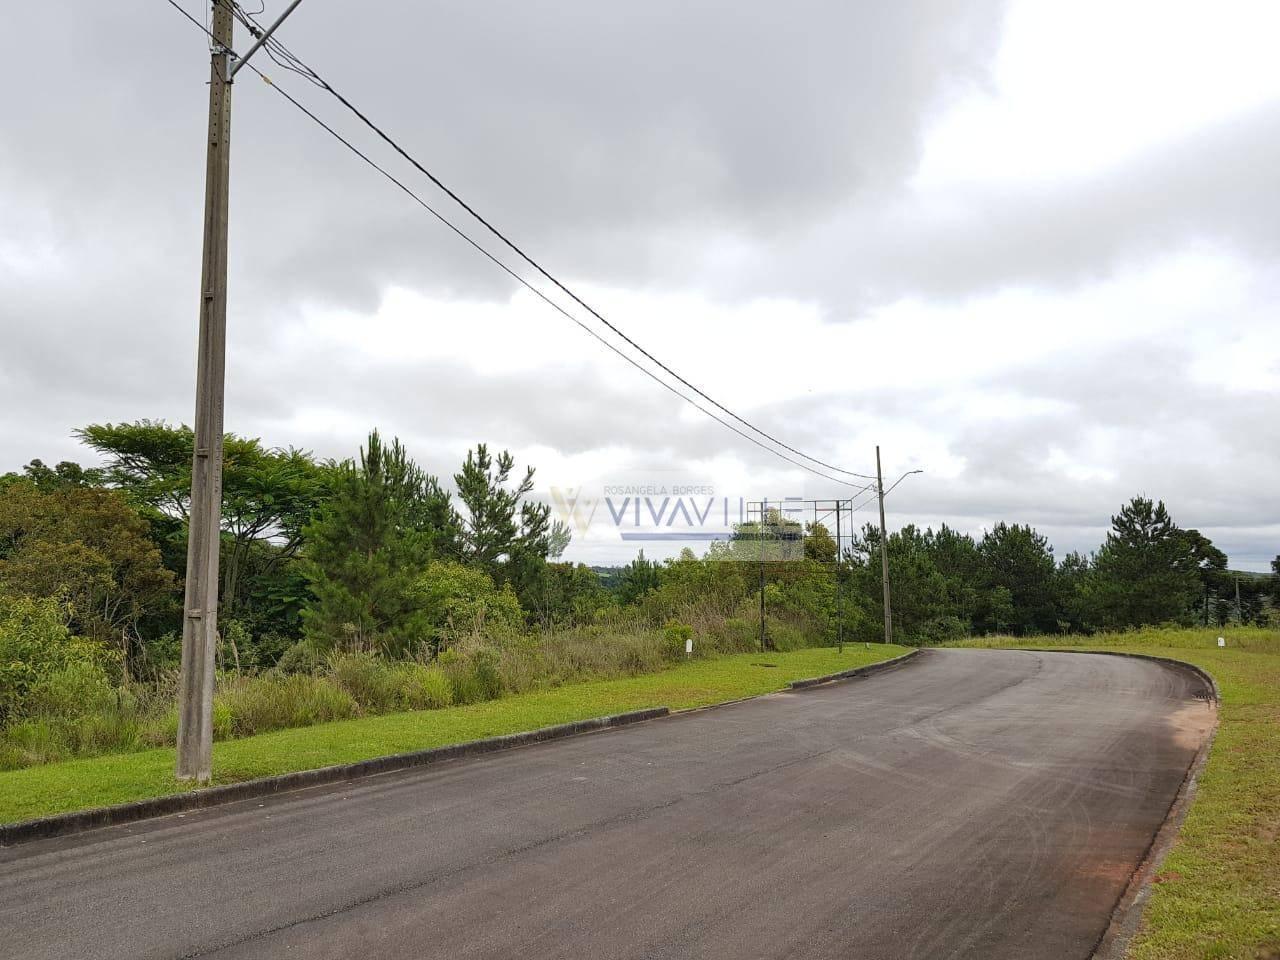 Terreno à venda, por R$ 520.000 - Menino Deus - Quatro Barras/PR